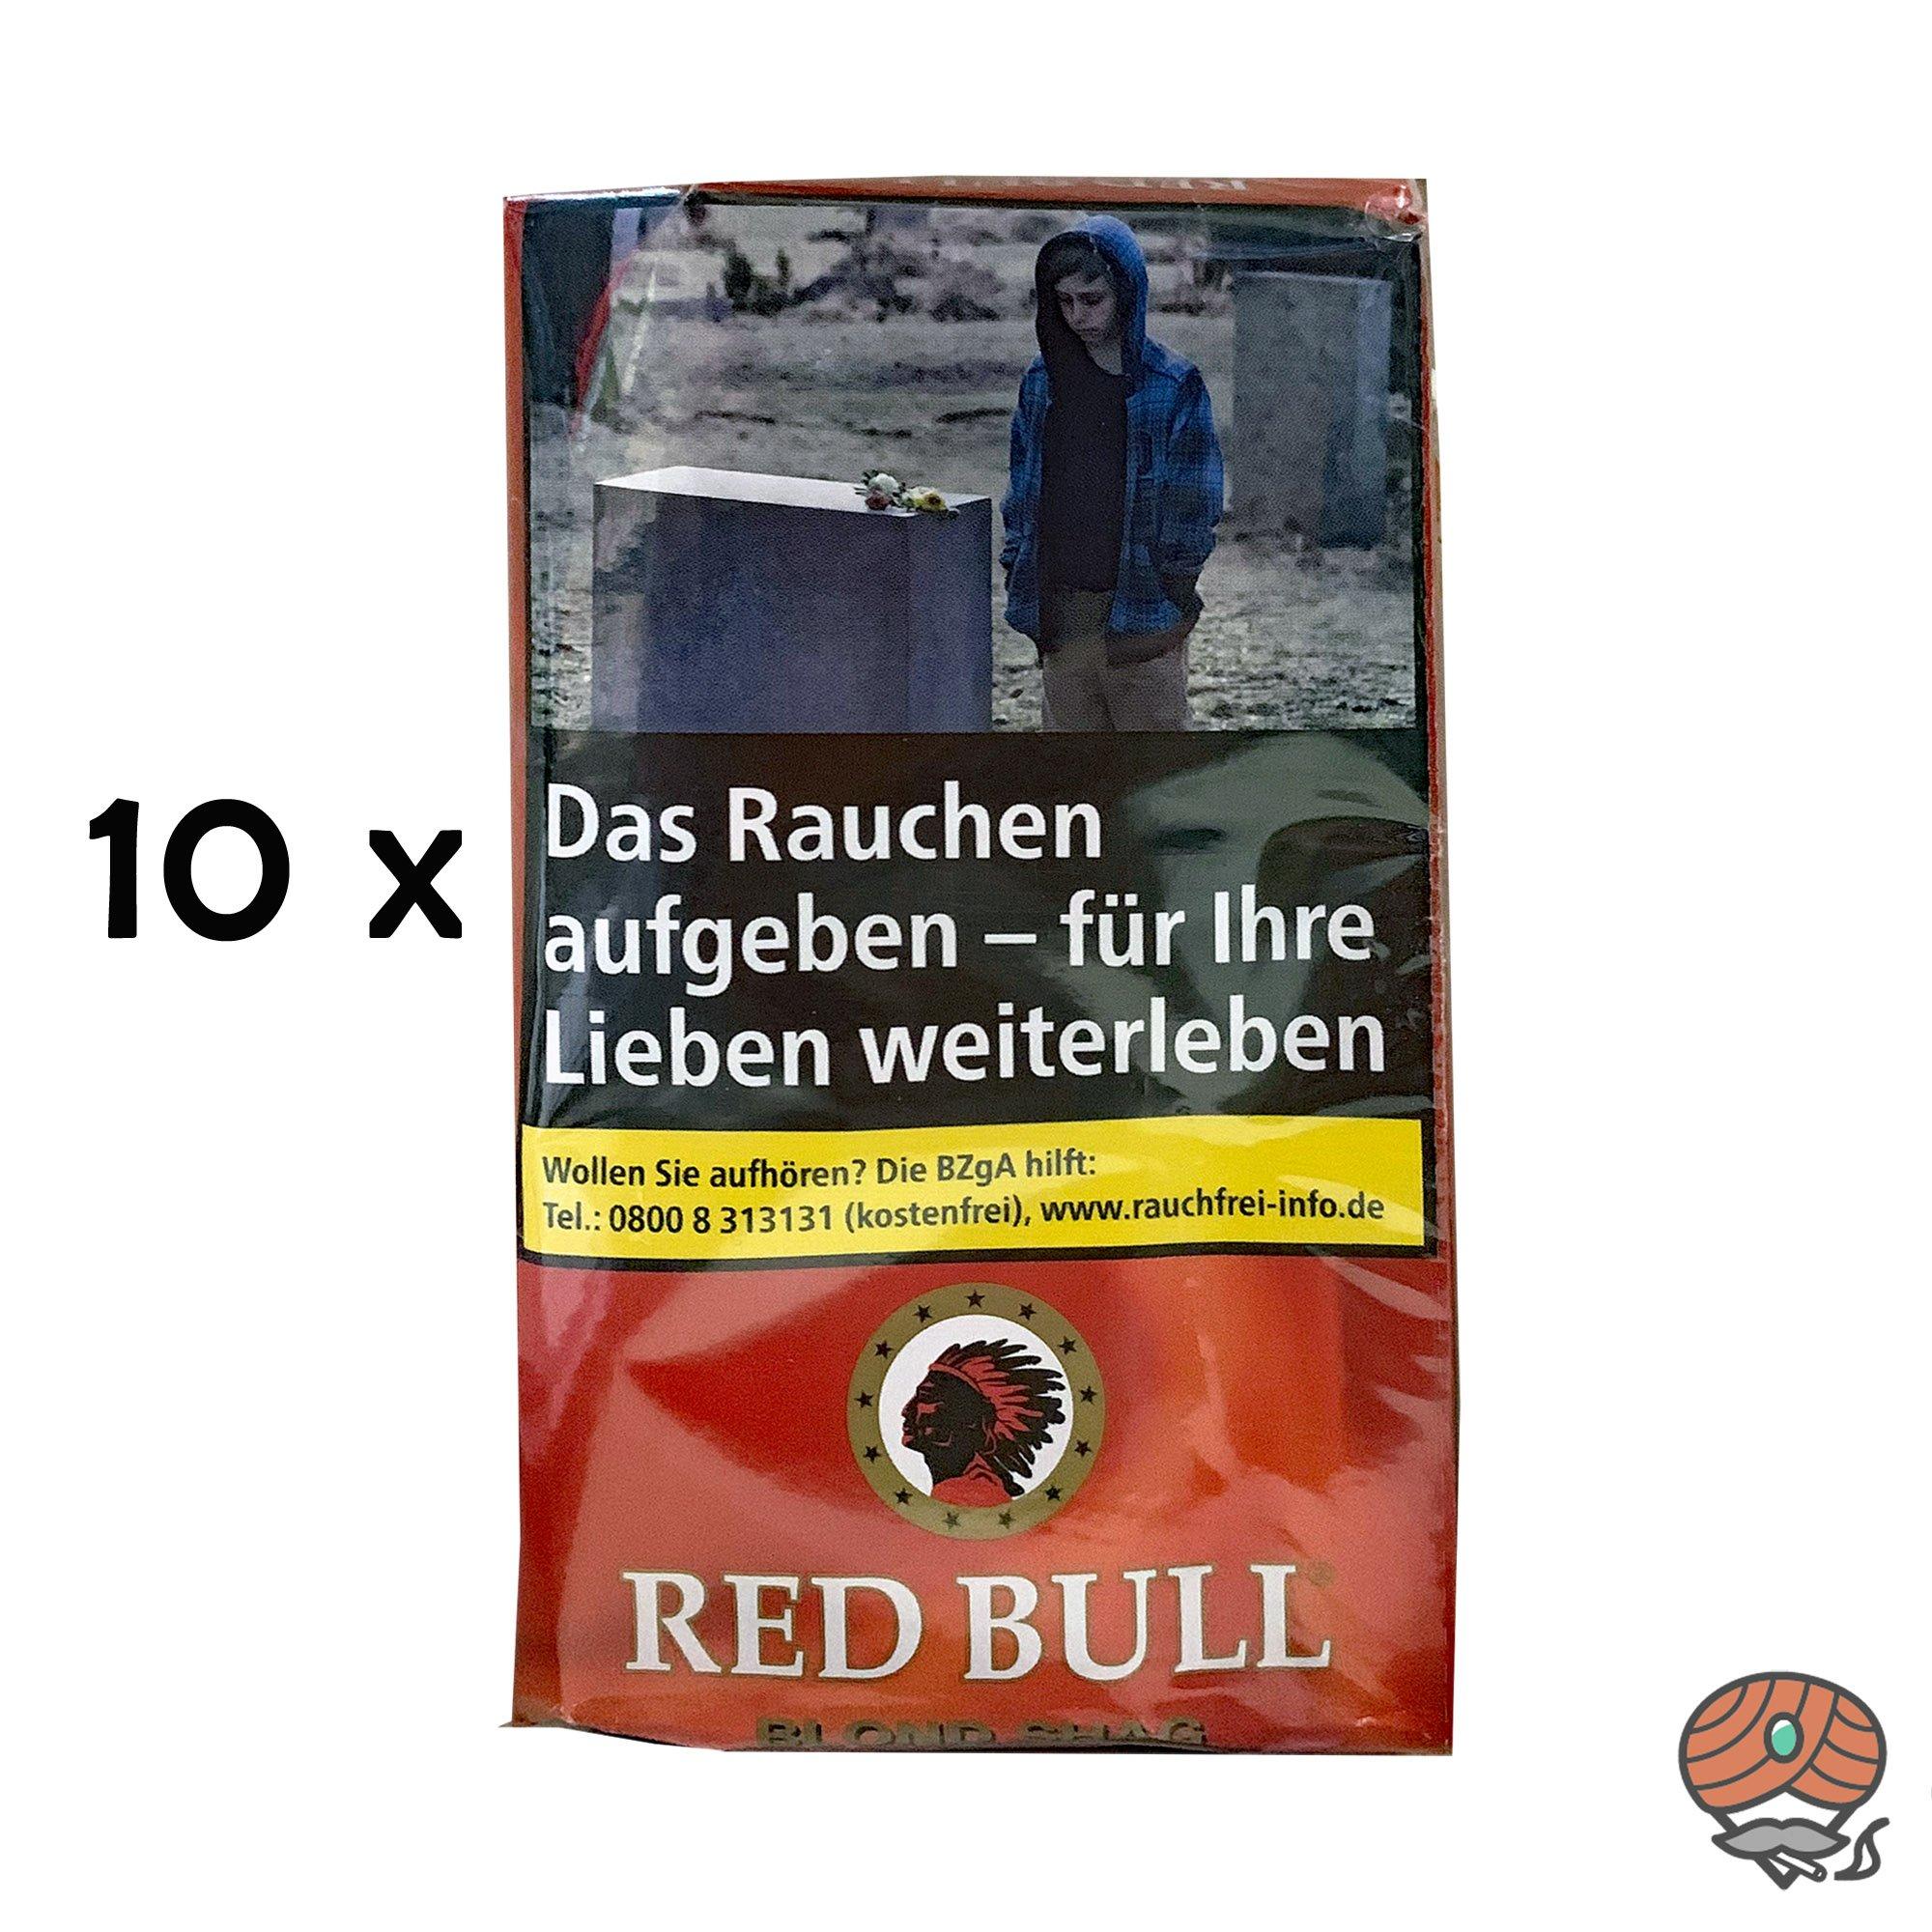 10 x Red Bull Blond Shag Zigarettentabak Pouch à 40g